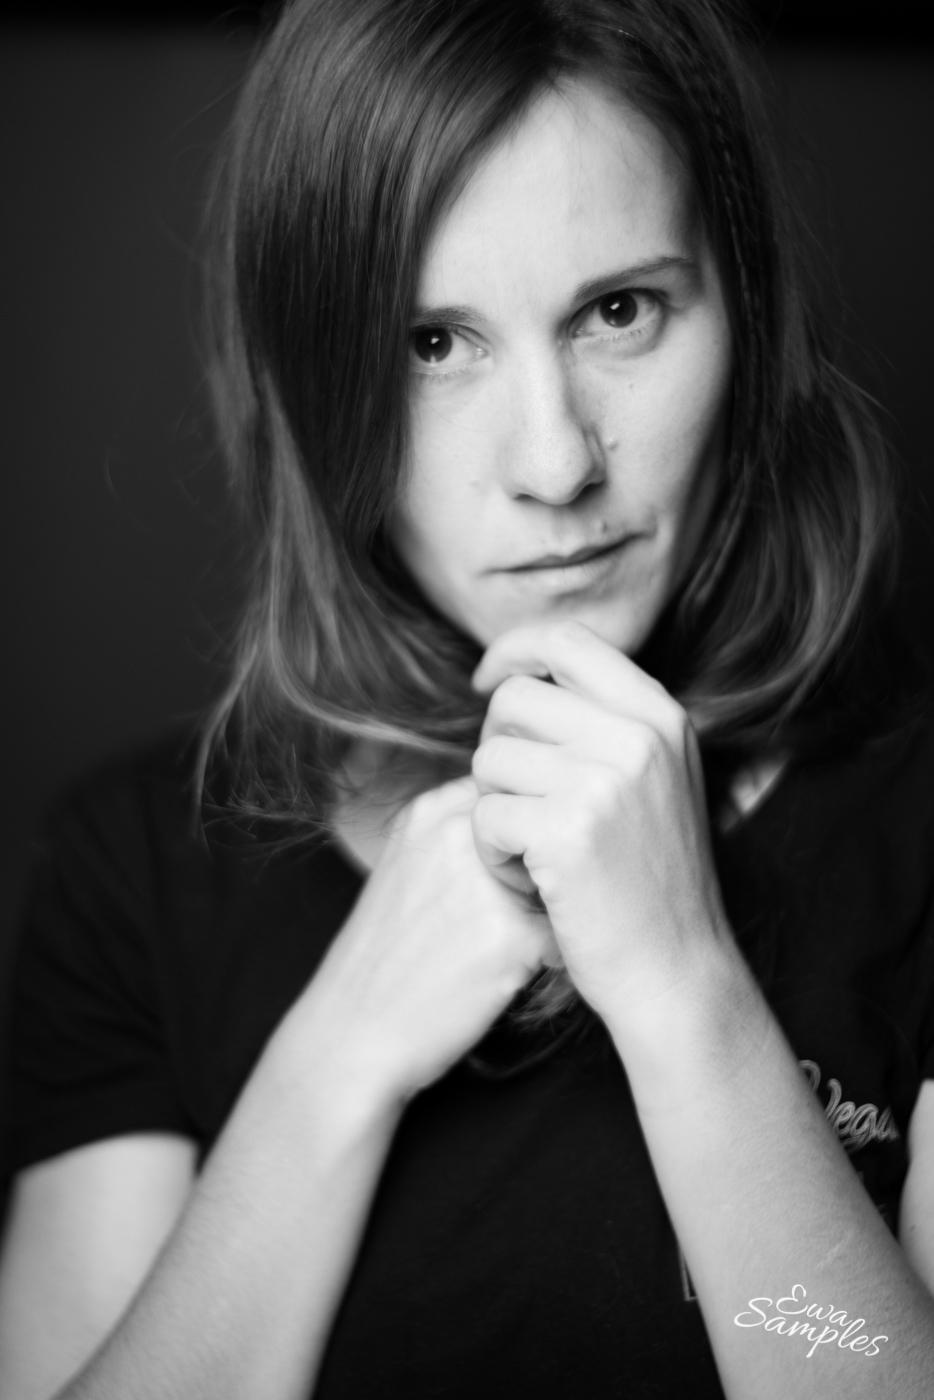 Portraits inspired by Francesco Scavullo